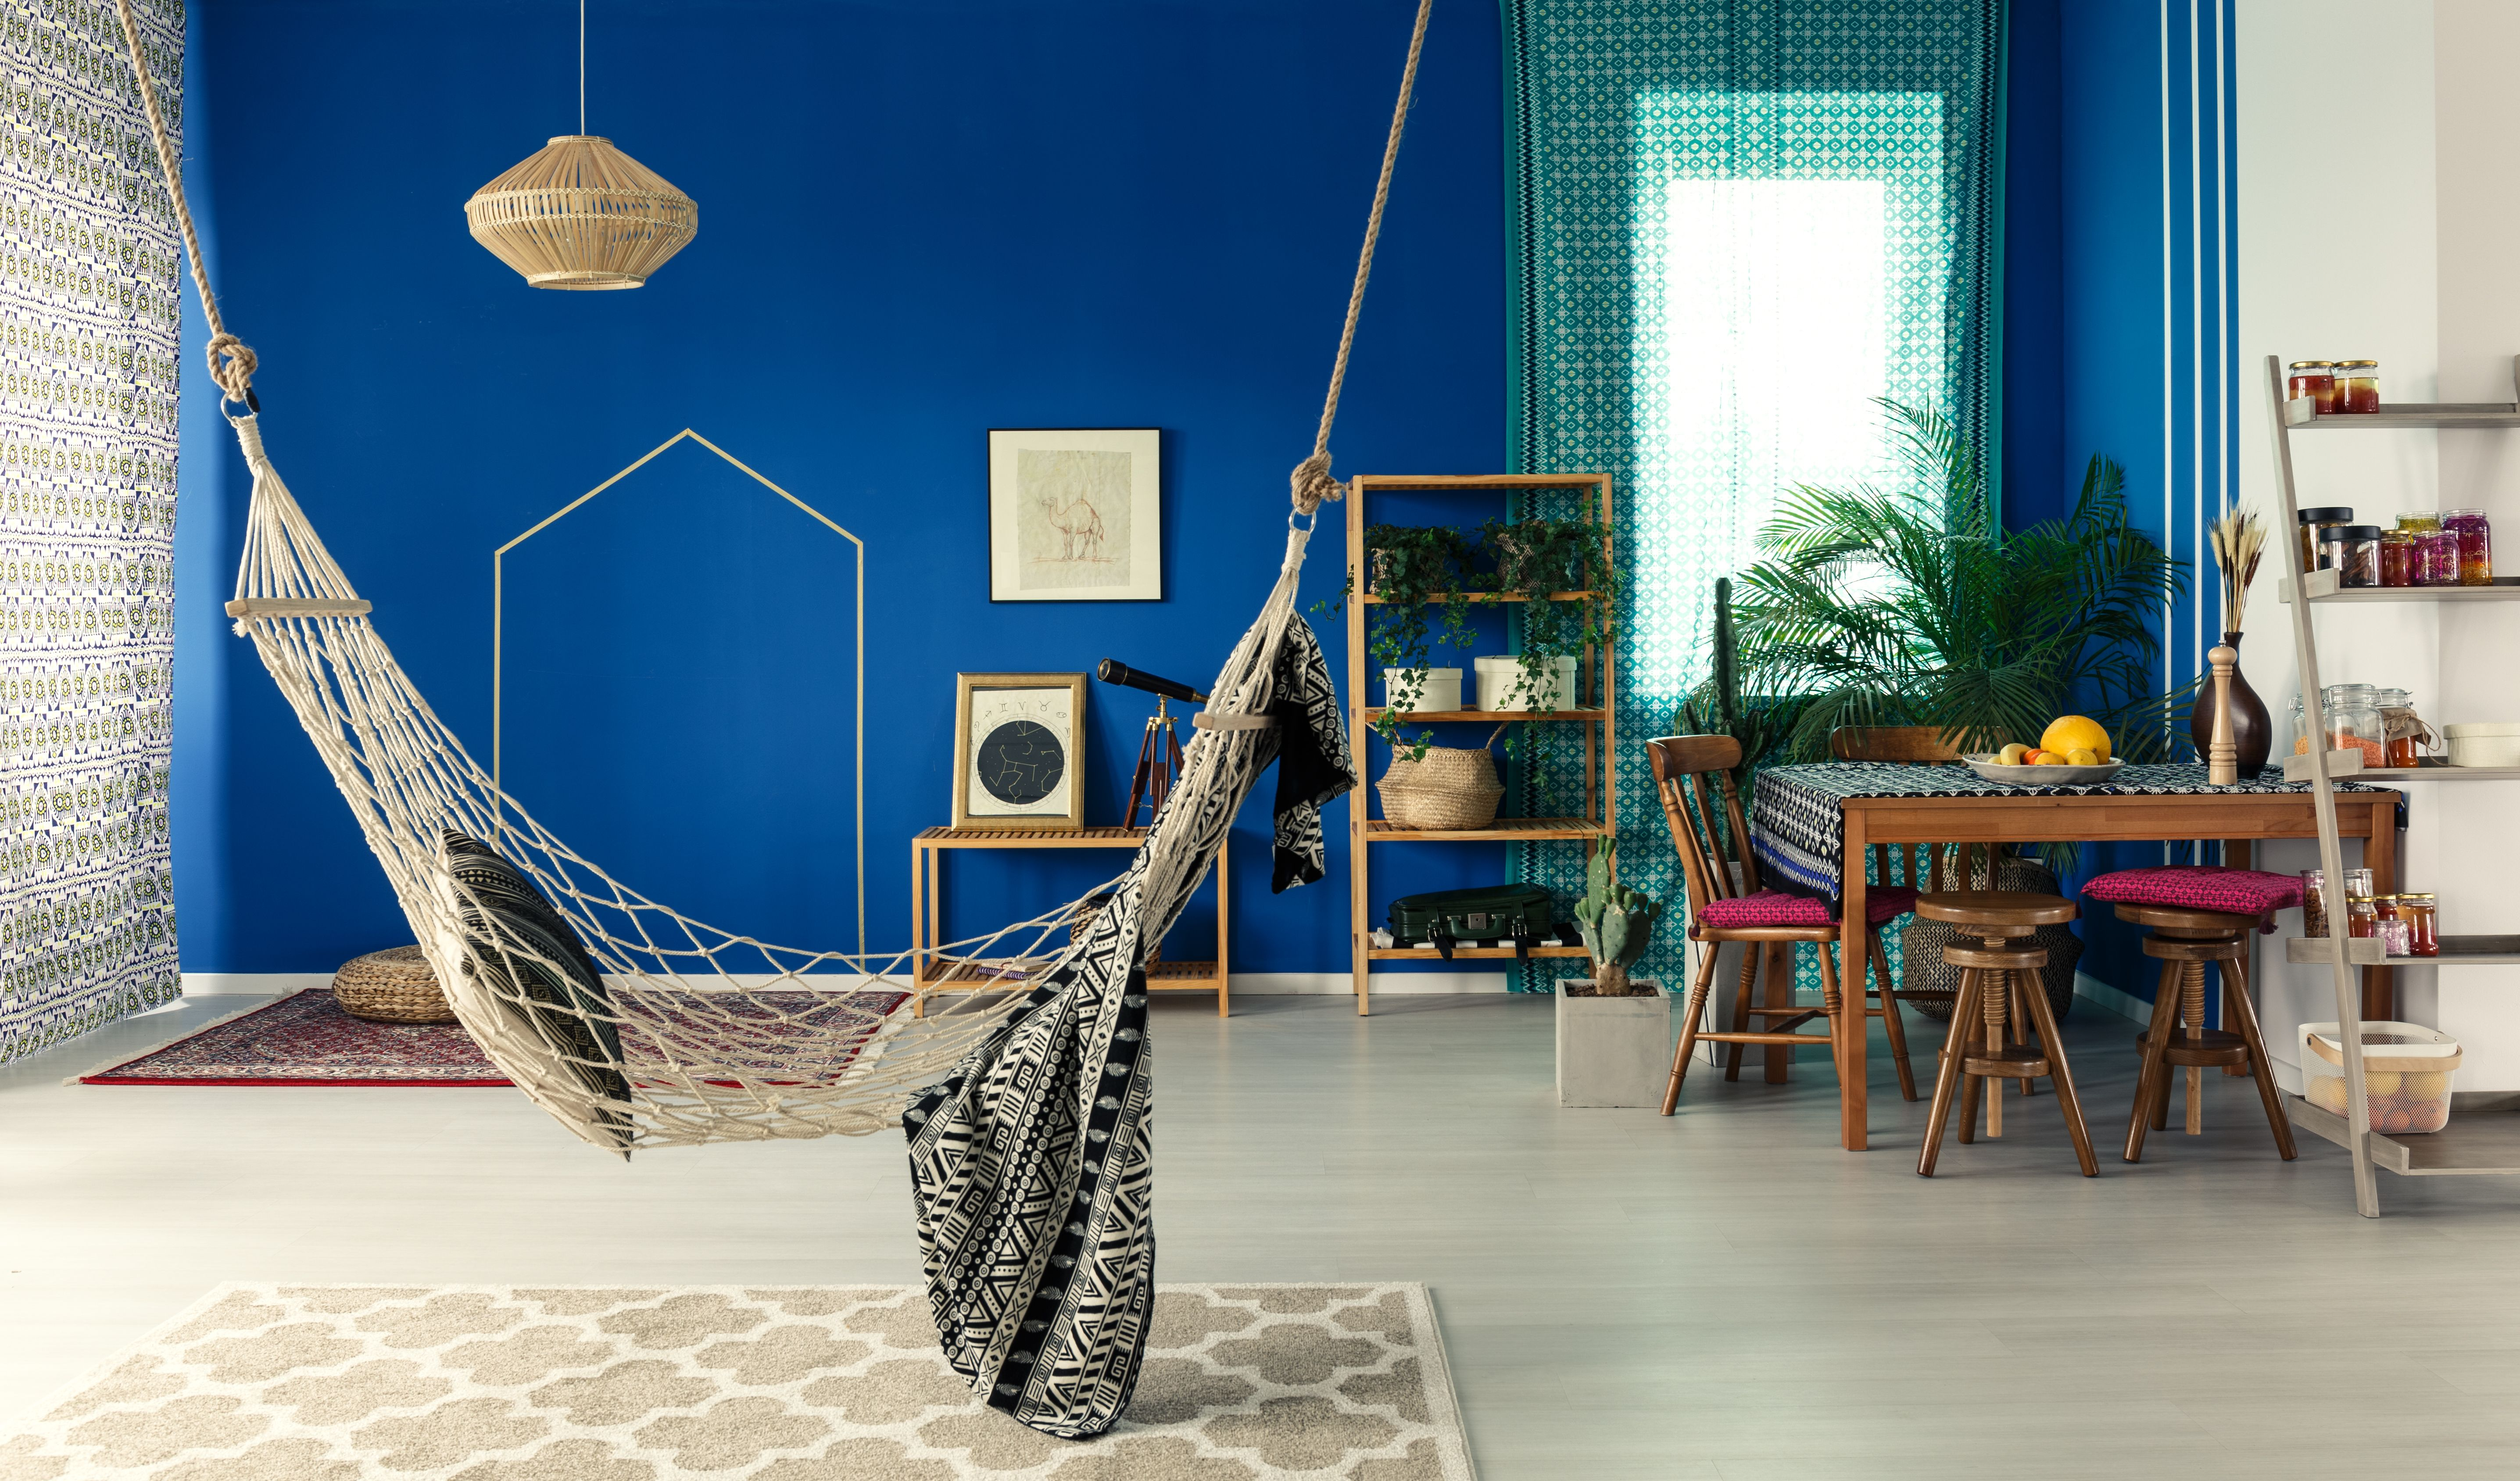 bohemian apartment with hammock.jpg